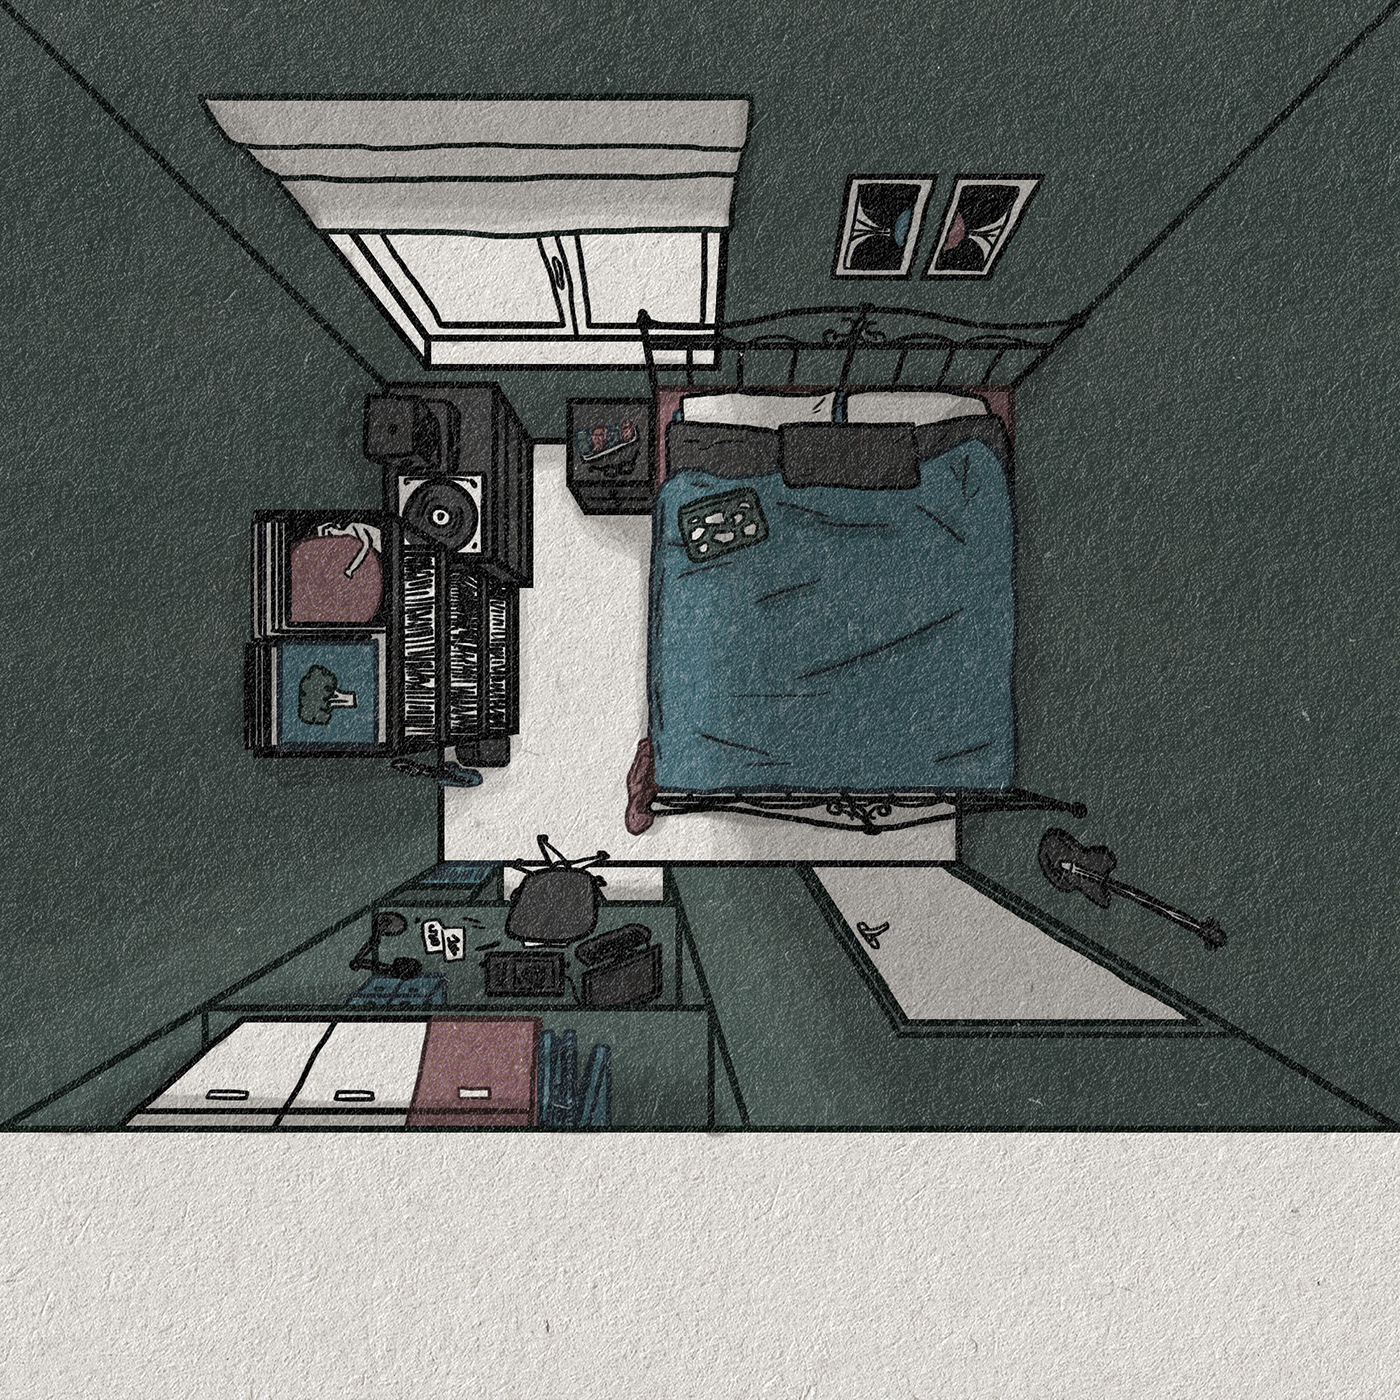 design Digital Art  ILLUSTRATION  Limited colour lockdown personal project texture